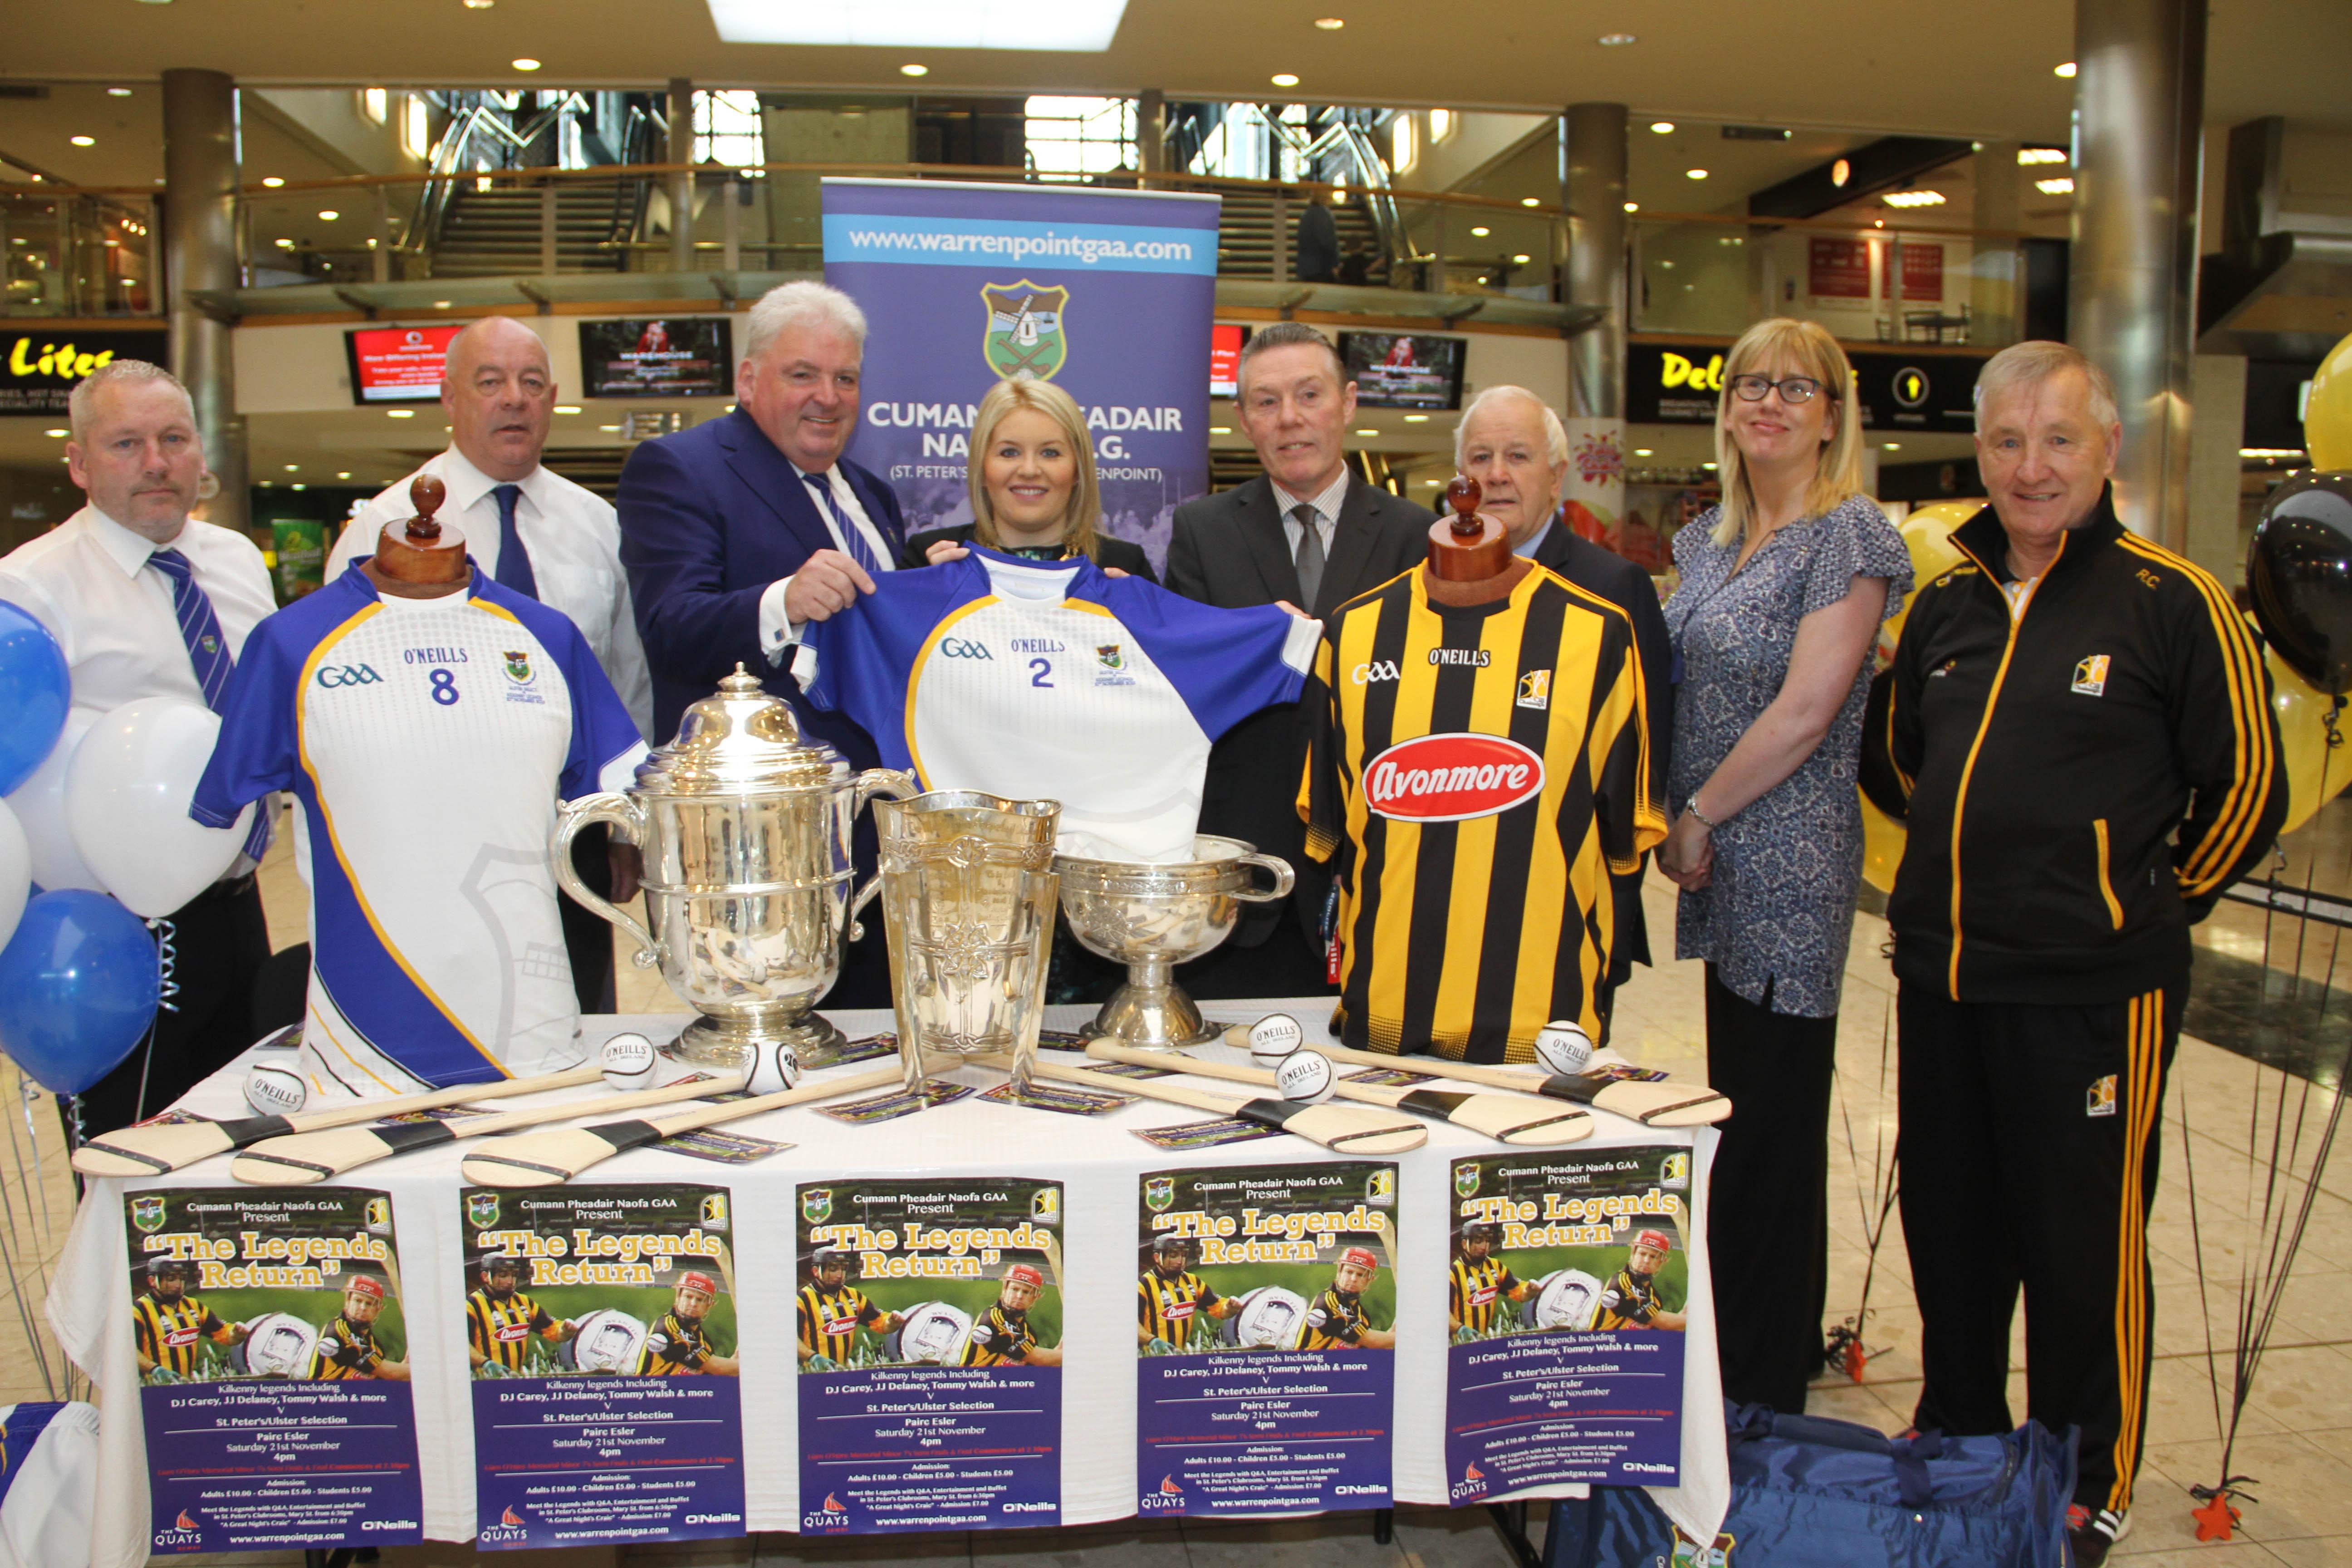 Launch of the Kilkenny Legends Return